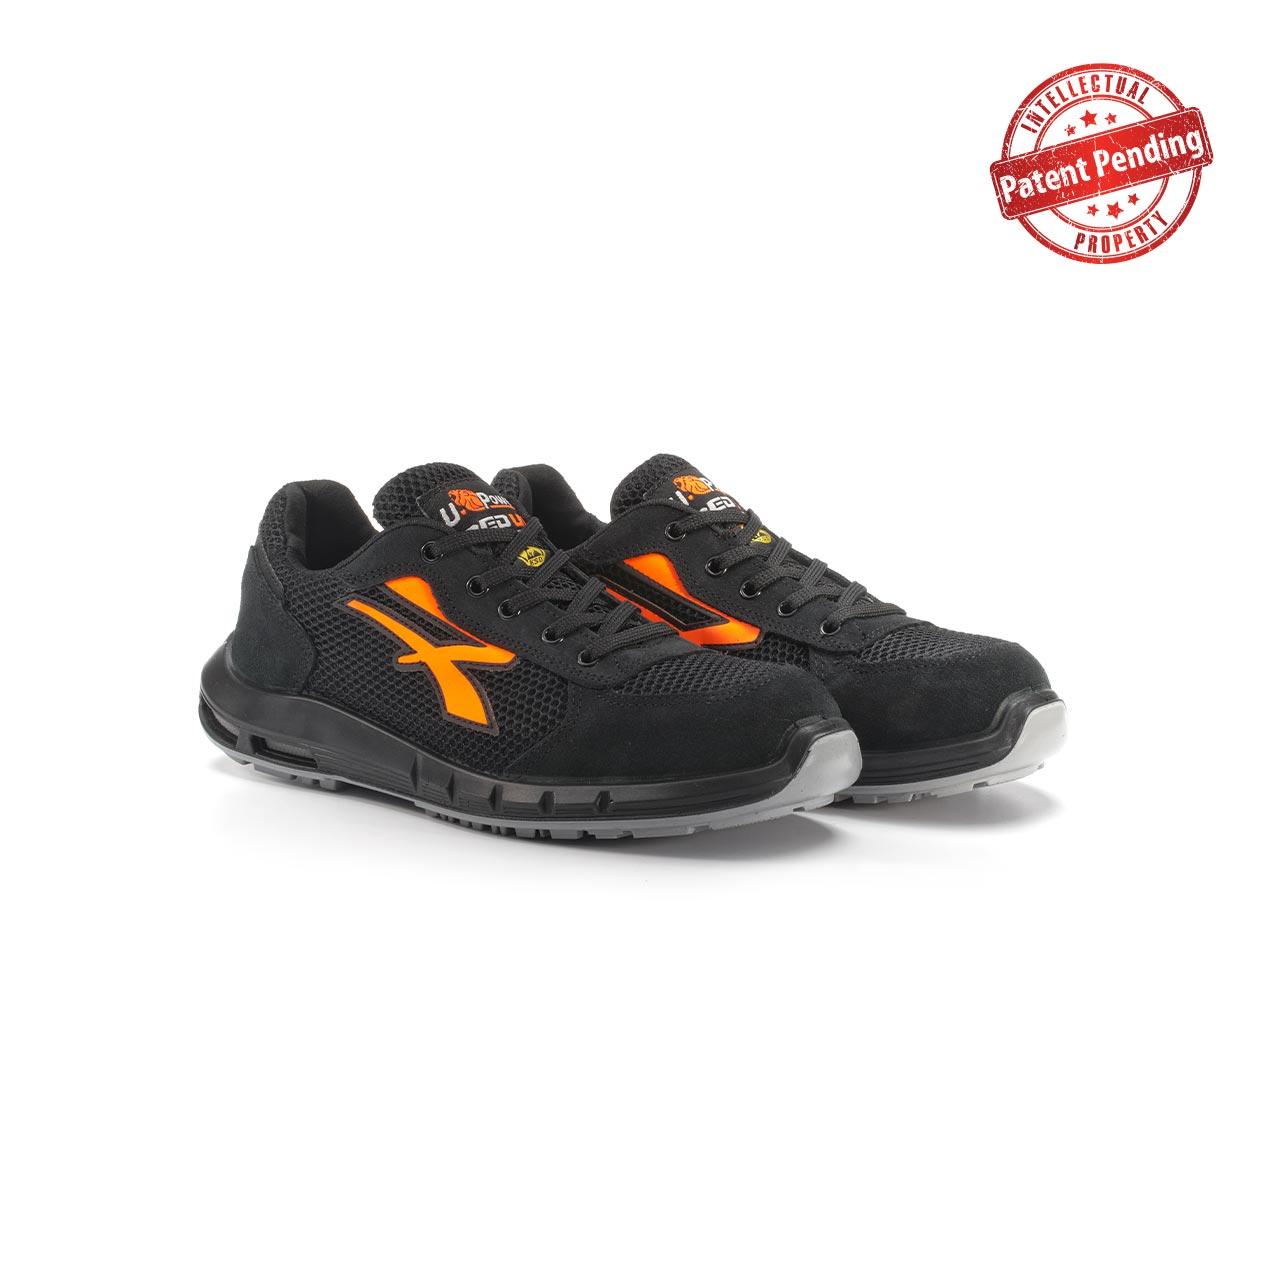 paio di scarpe antinfortunistiche upower modello atos plus linea redup plus vista prospettica